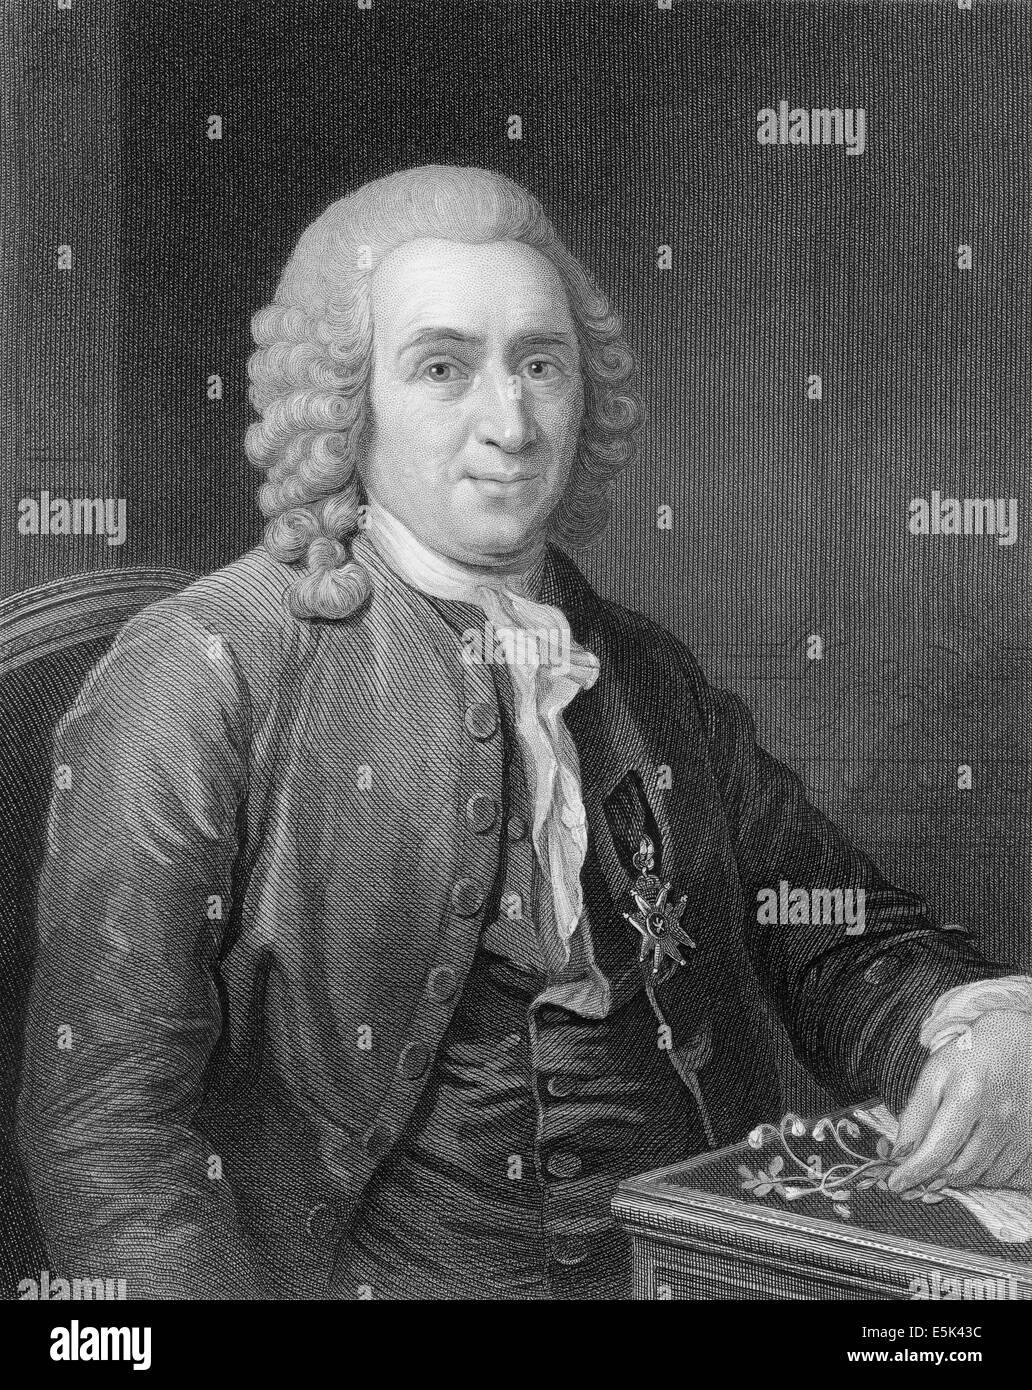 Carl Linnaeus,  or Carl von Linné, 1707-1778, a Swedish botanist, physician, and zoologist, Stock Photo